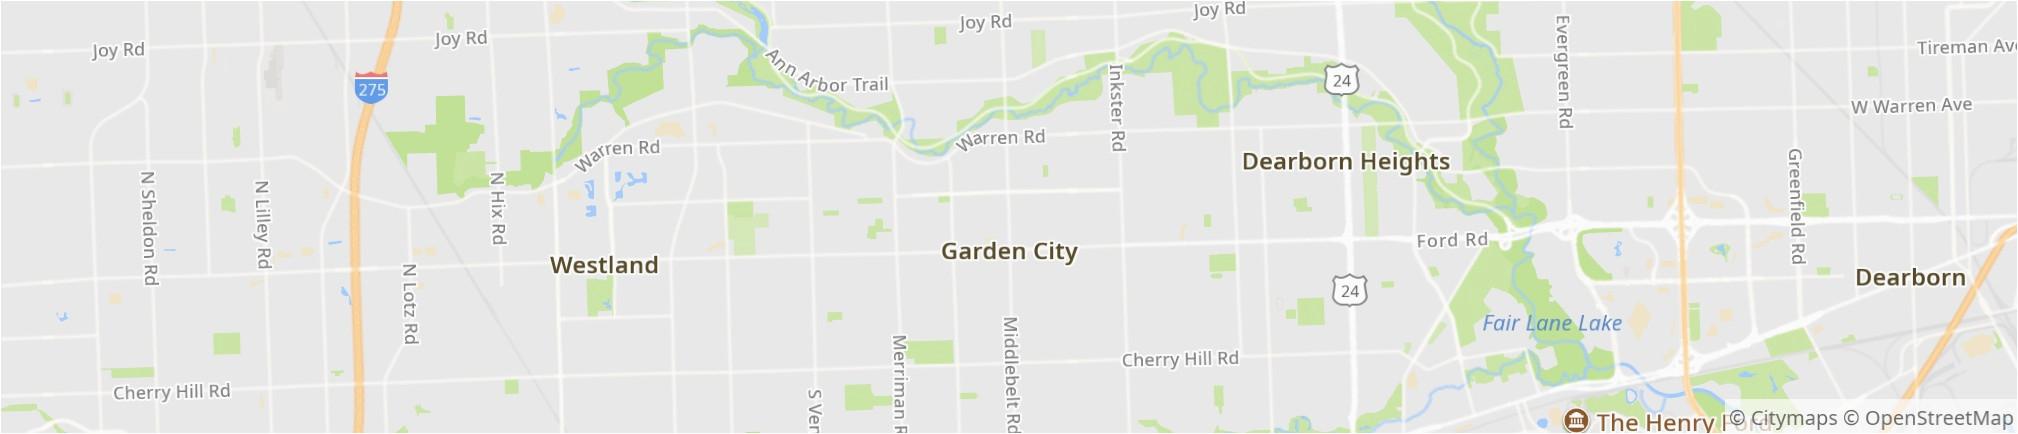 garden city 2019 best of garden city mi tourism tripadvisor